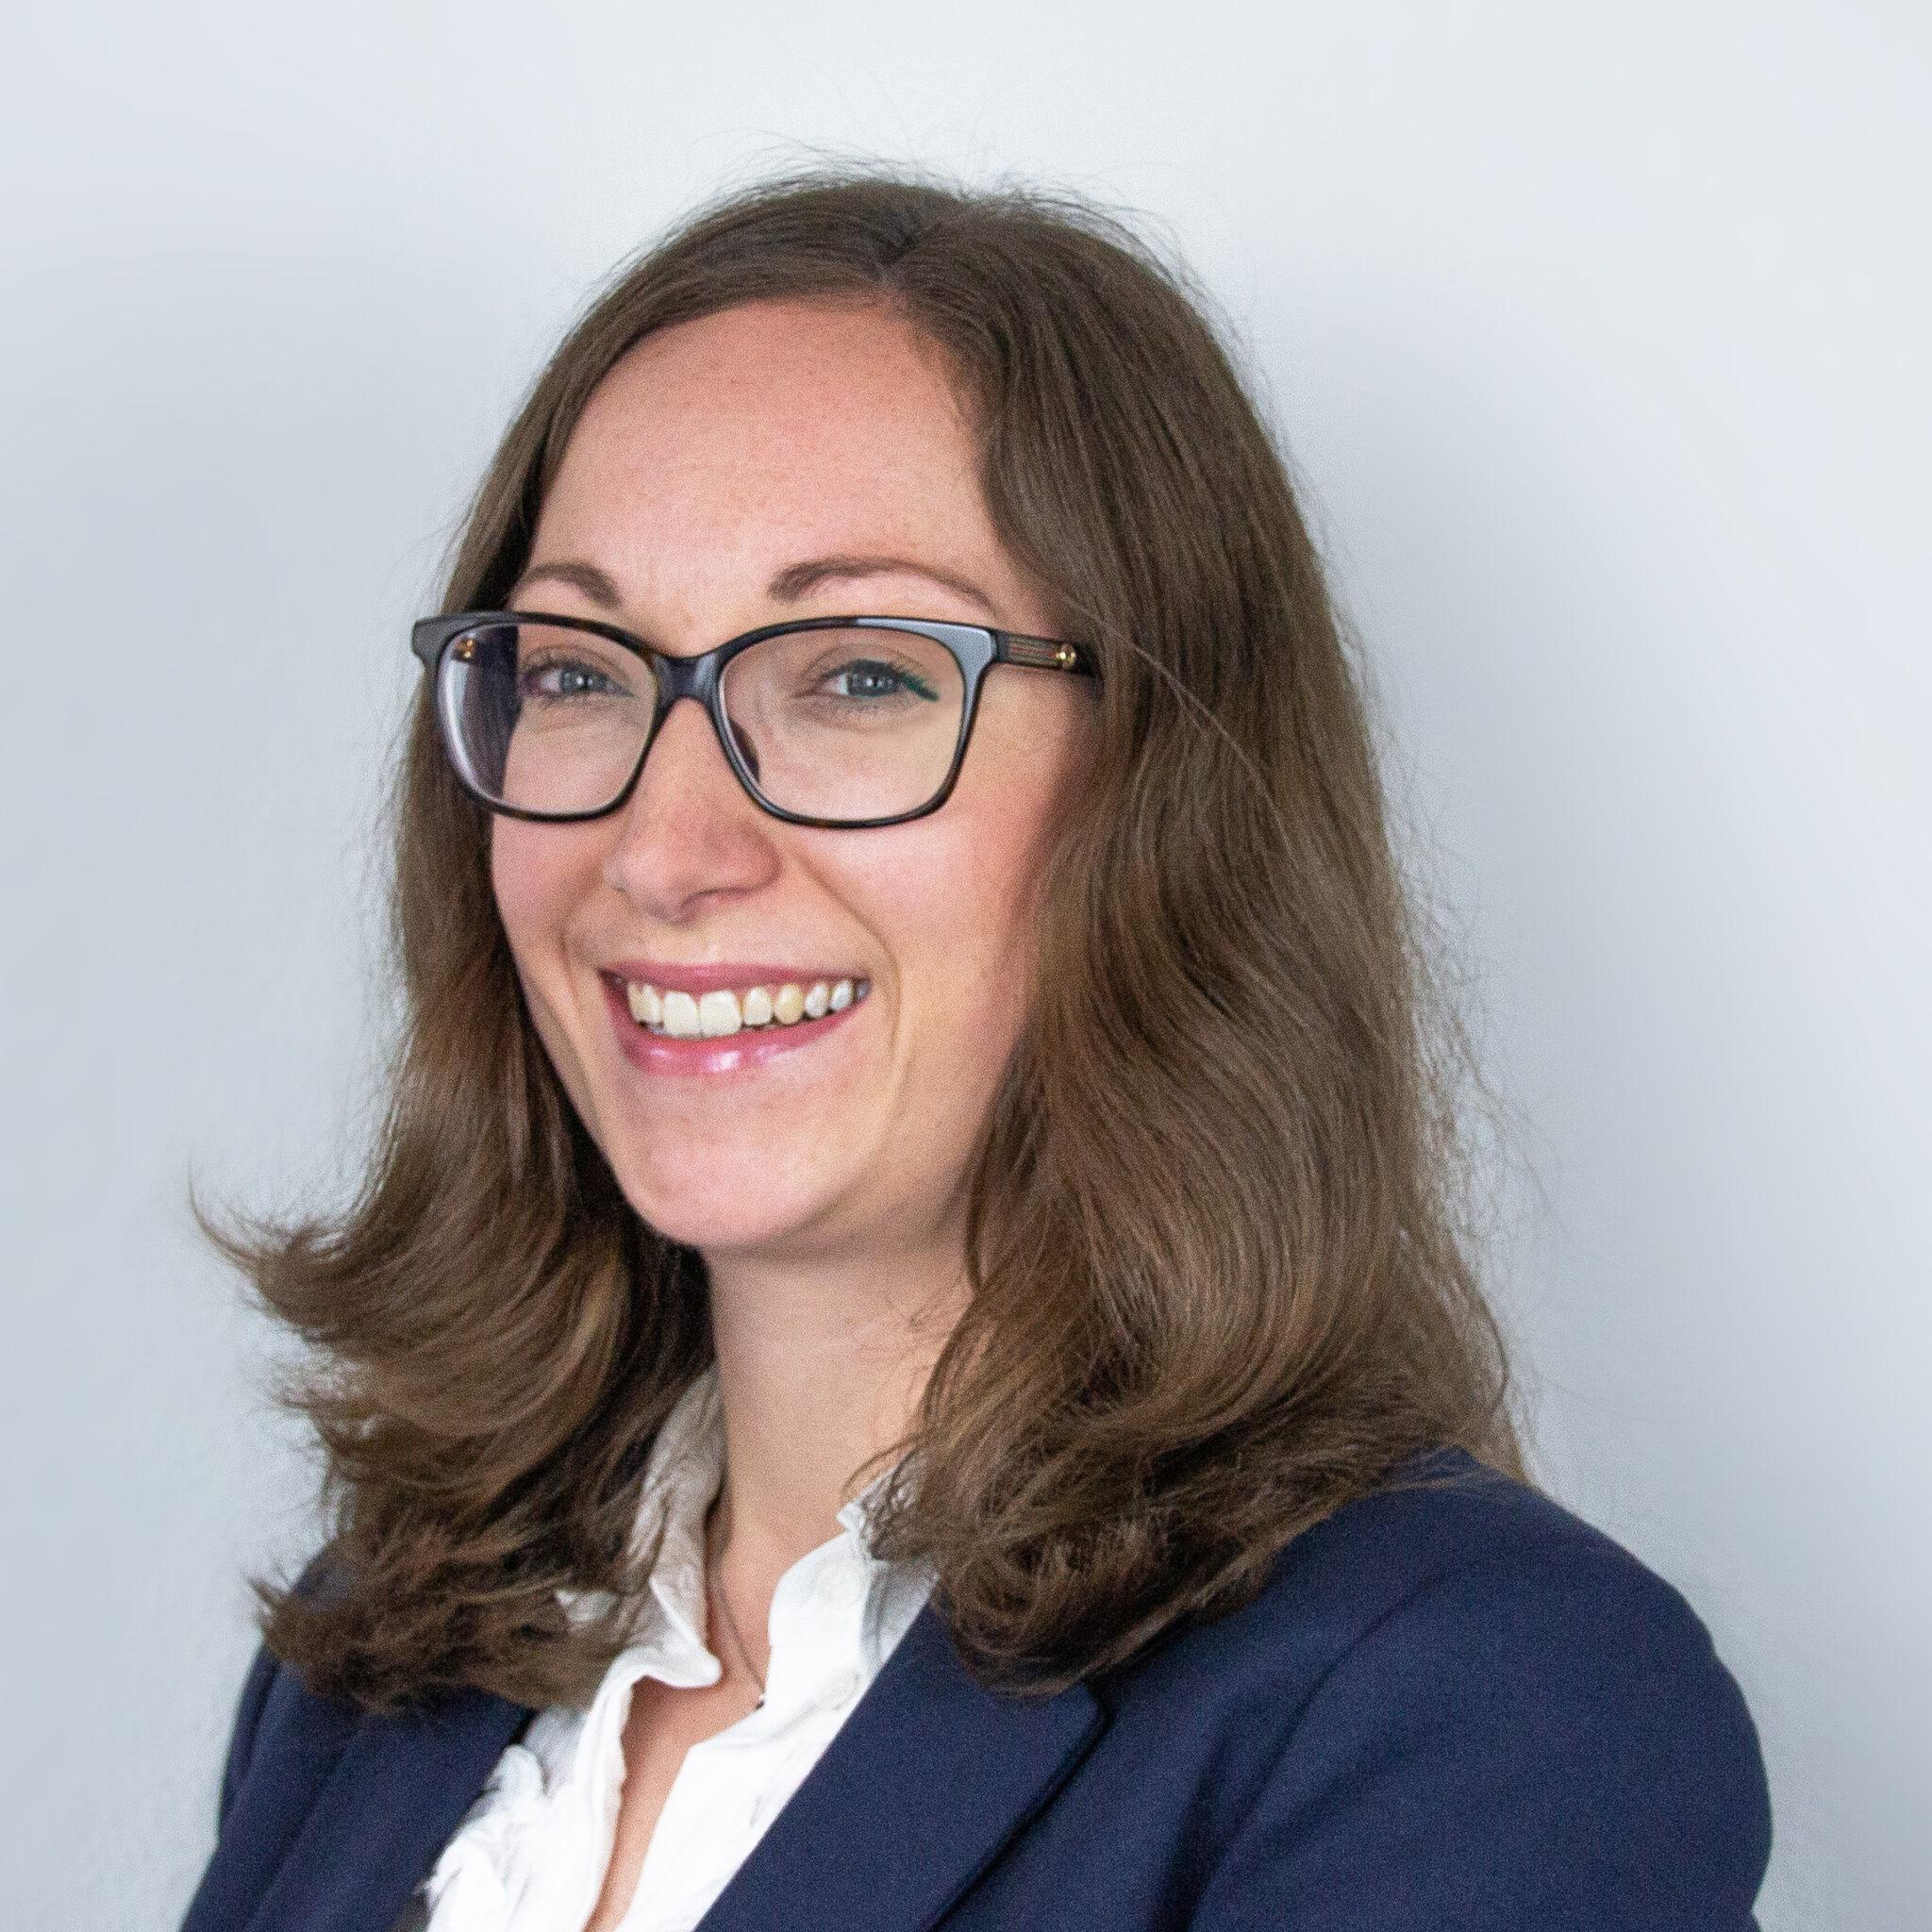 Sophie-Neuholz-Rechtsanwaeltin1-Hillmann-und-Partner-Rechtsanwaelte-Oldenburg